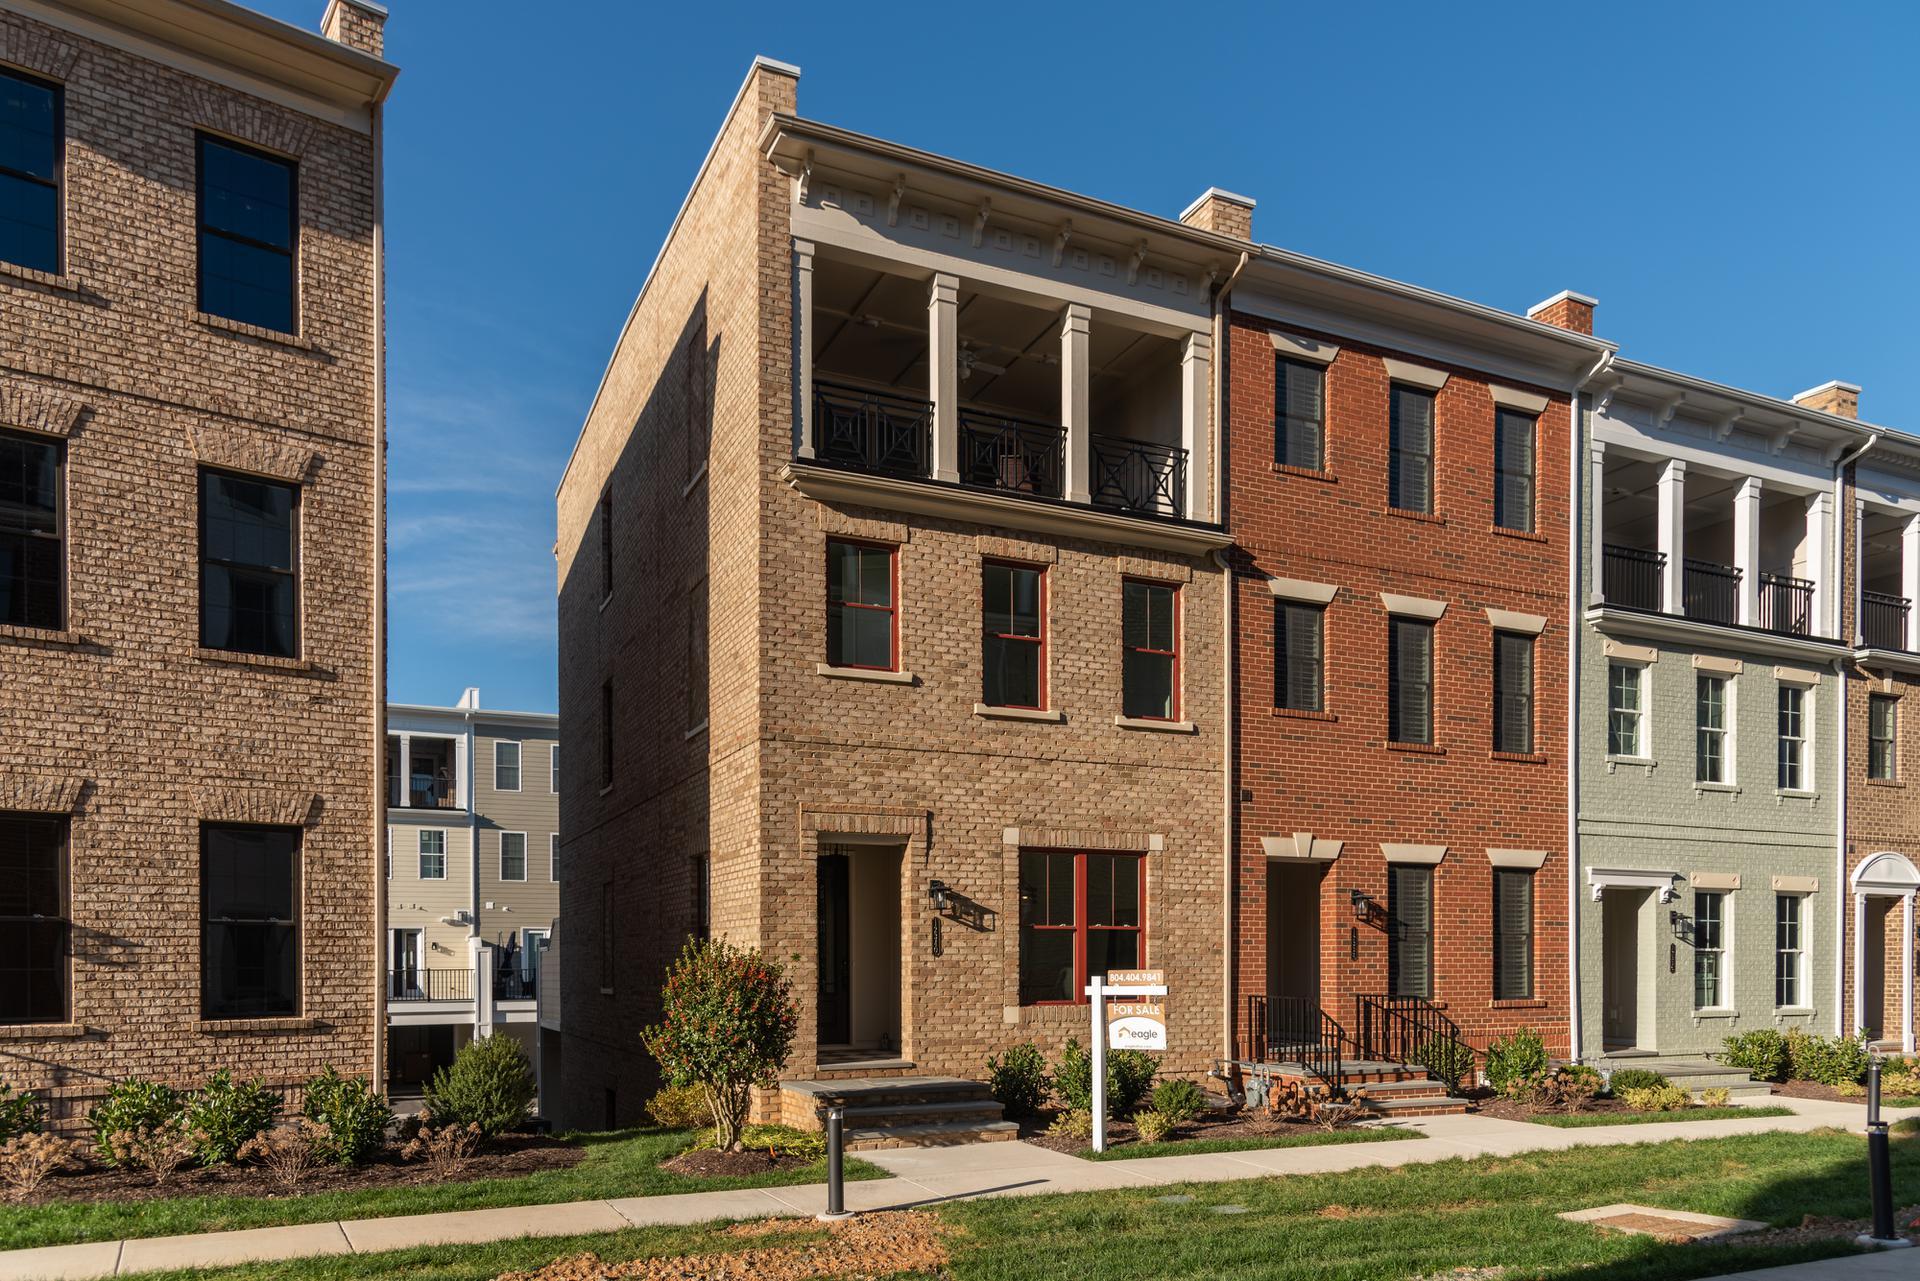 12340 Purbrook Walk #83, Henrico, VA 23233 Home for Sale